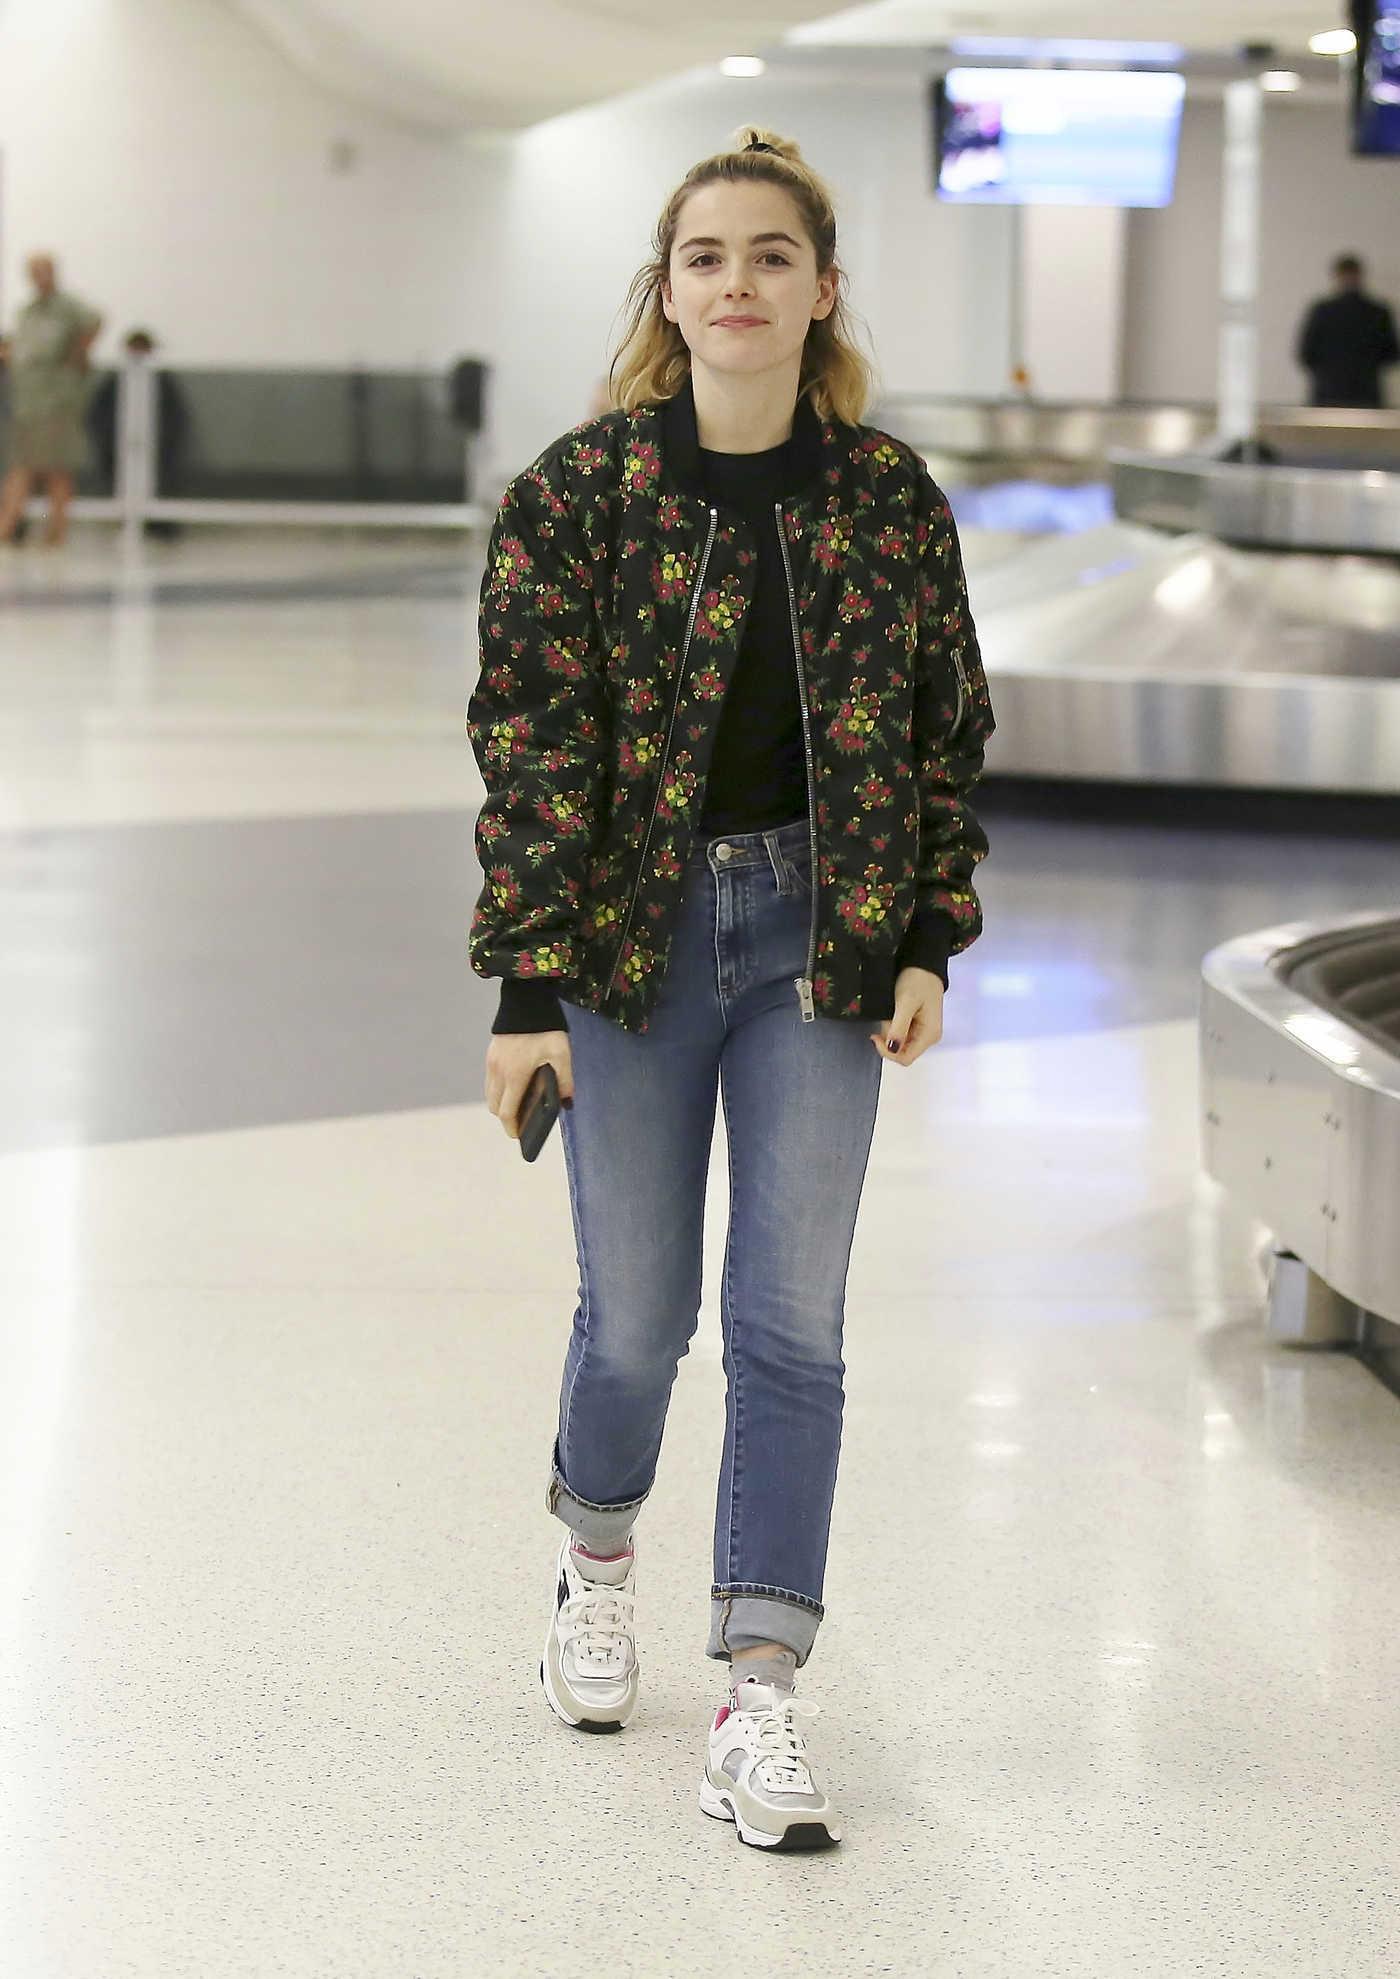 Kiernan Shipka in a Black Floral Print Jacket Arrives at LAX Airport in Los Angeles 09/29/2018